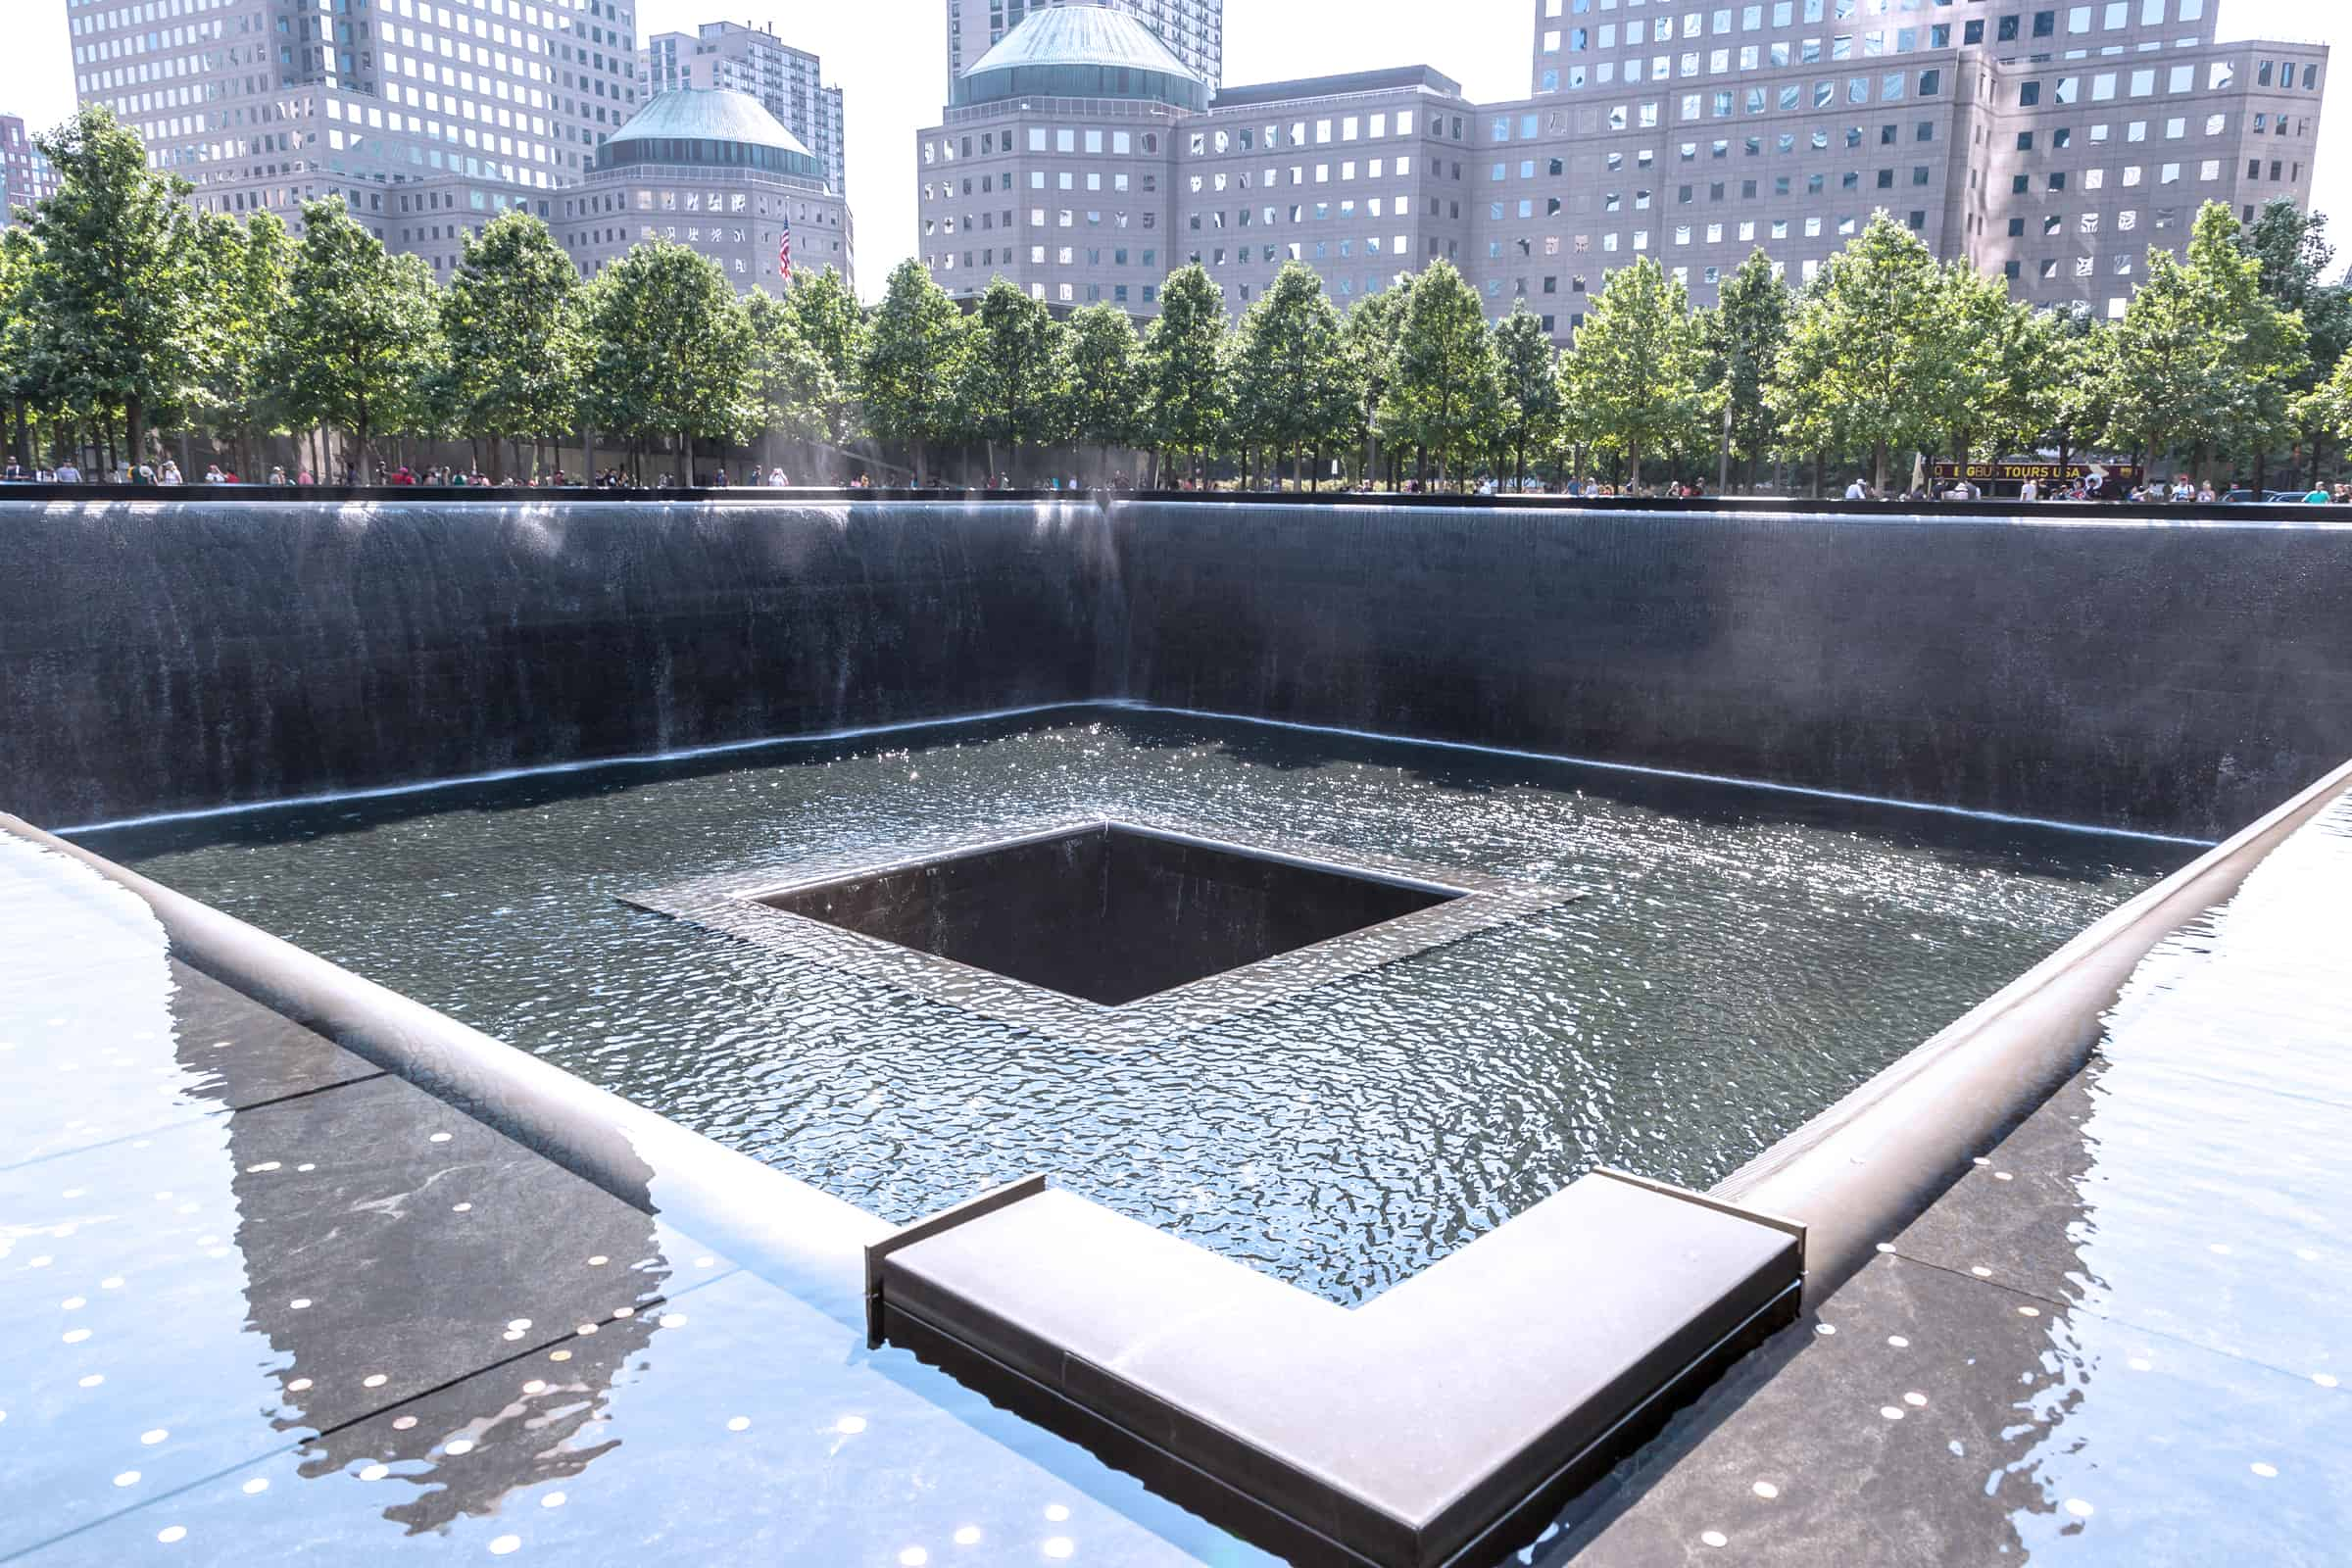 cj logistics america, 3pl, september 11, 911,